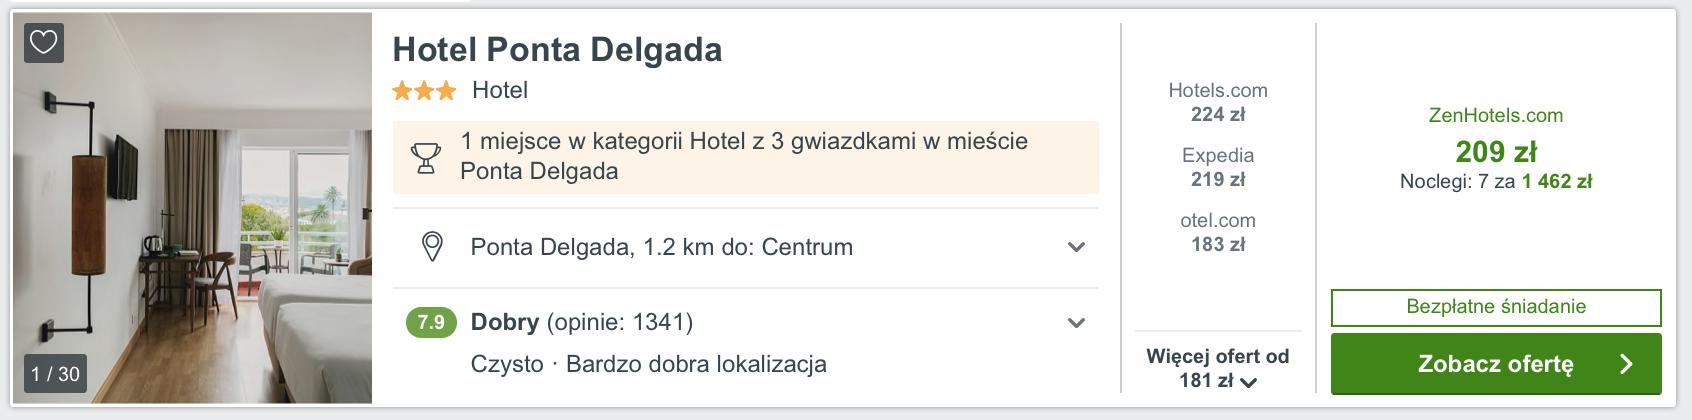 hotel pdl